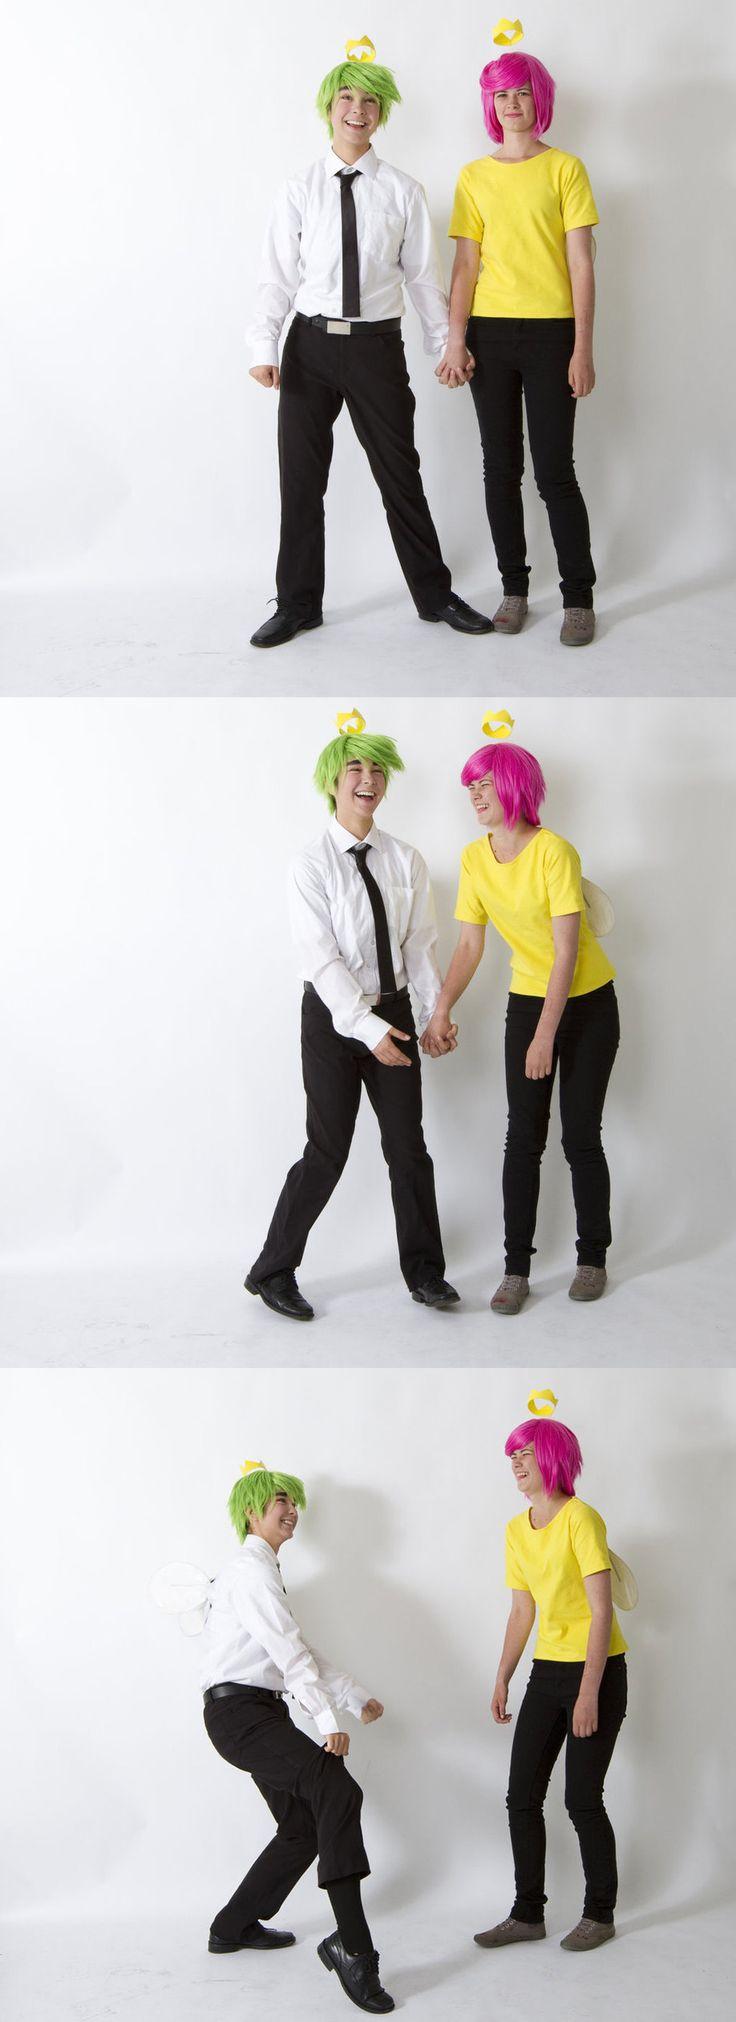 Cosmo and Wanda - Fairly Odd Parents